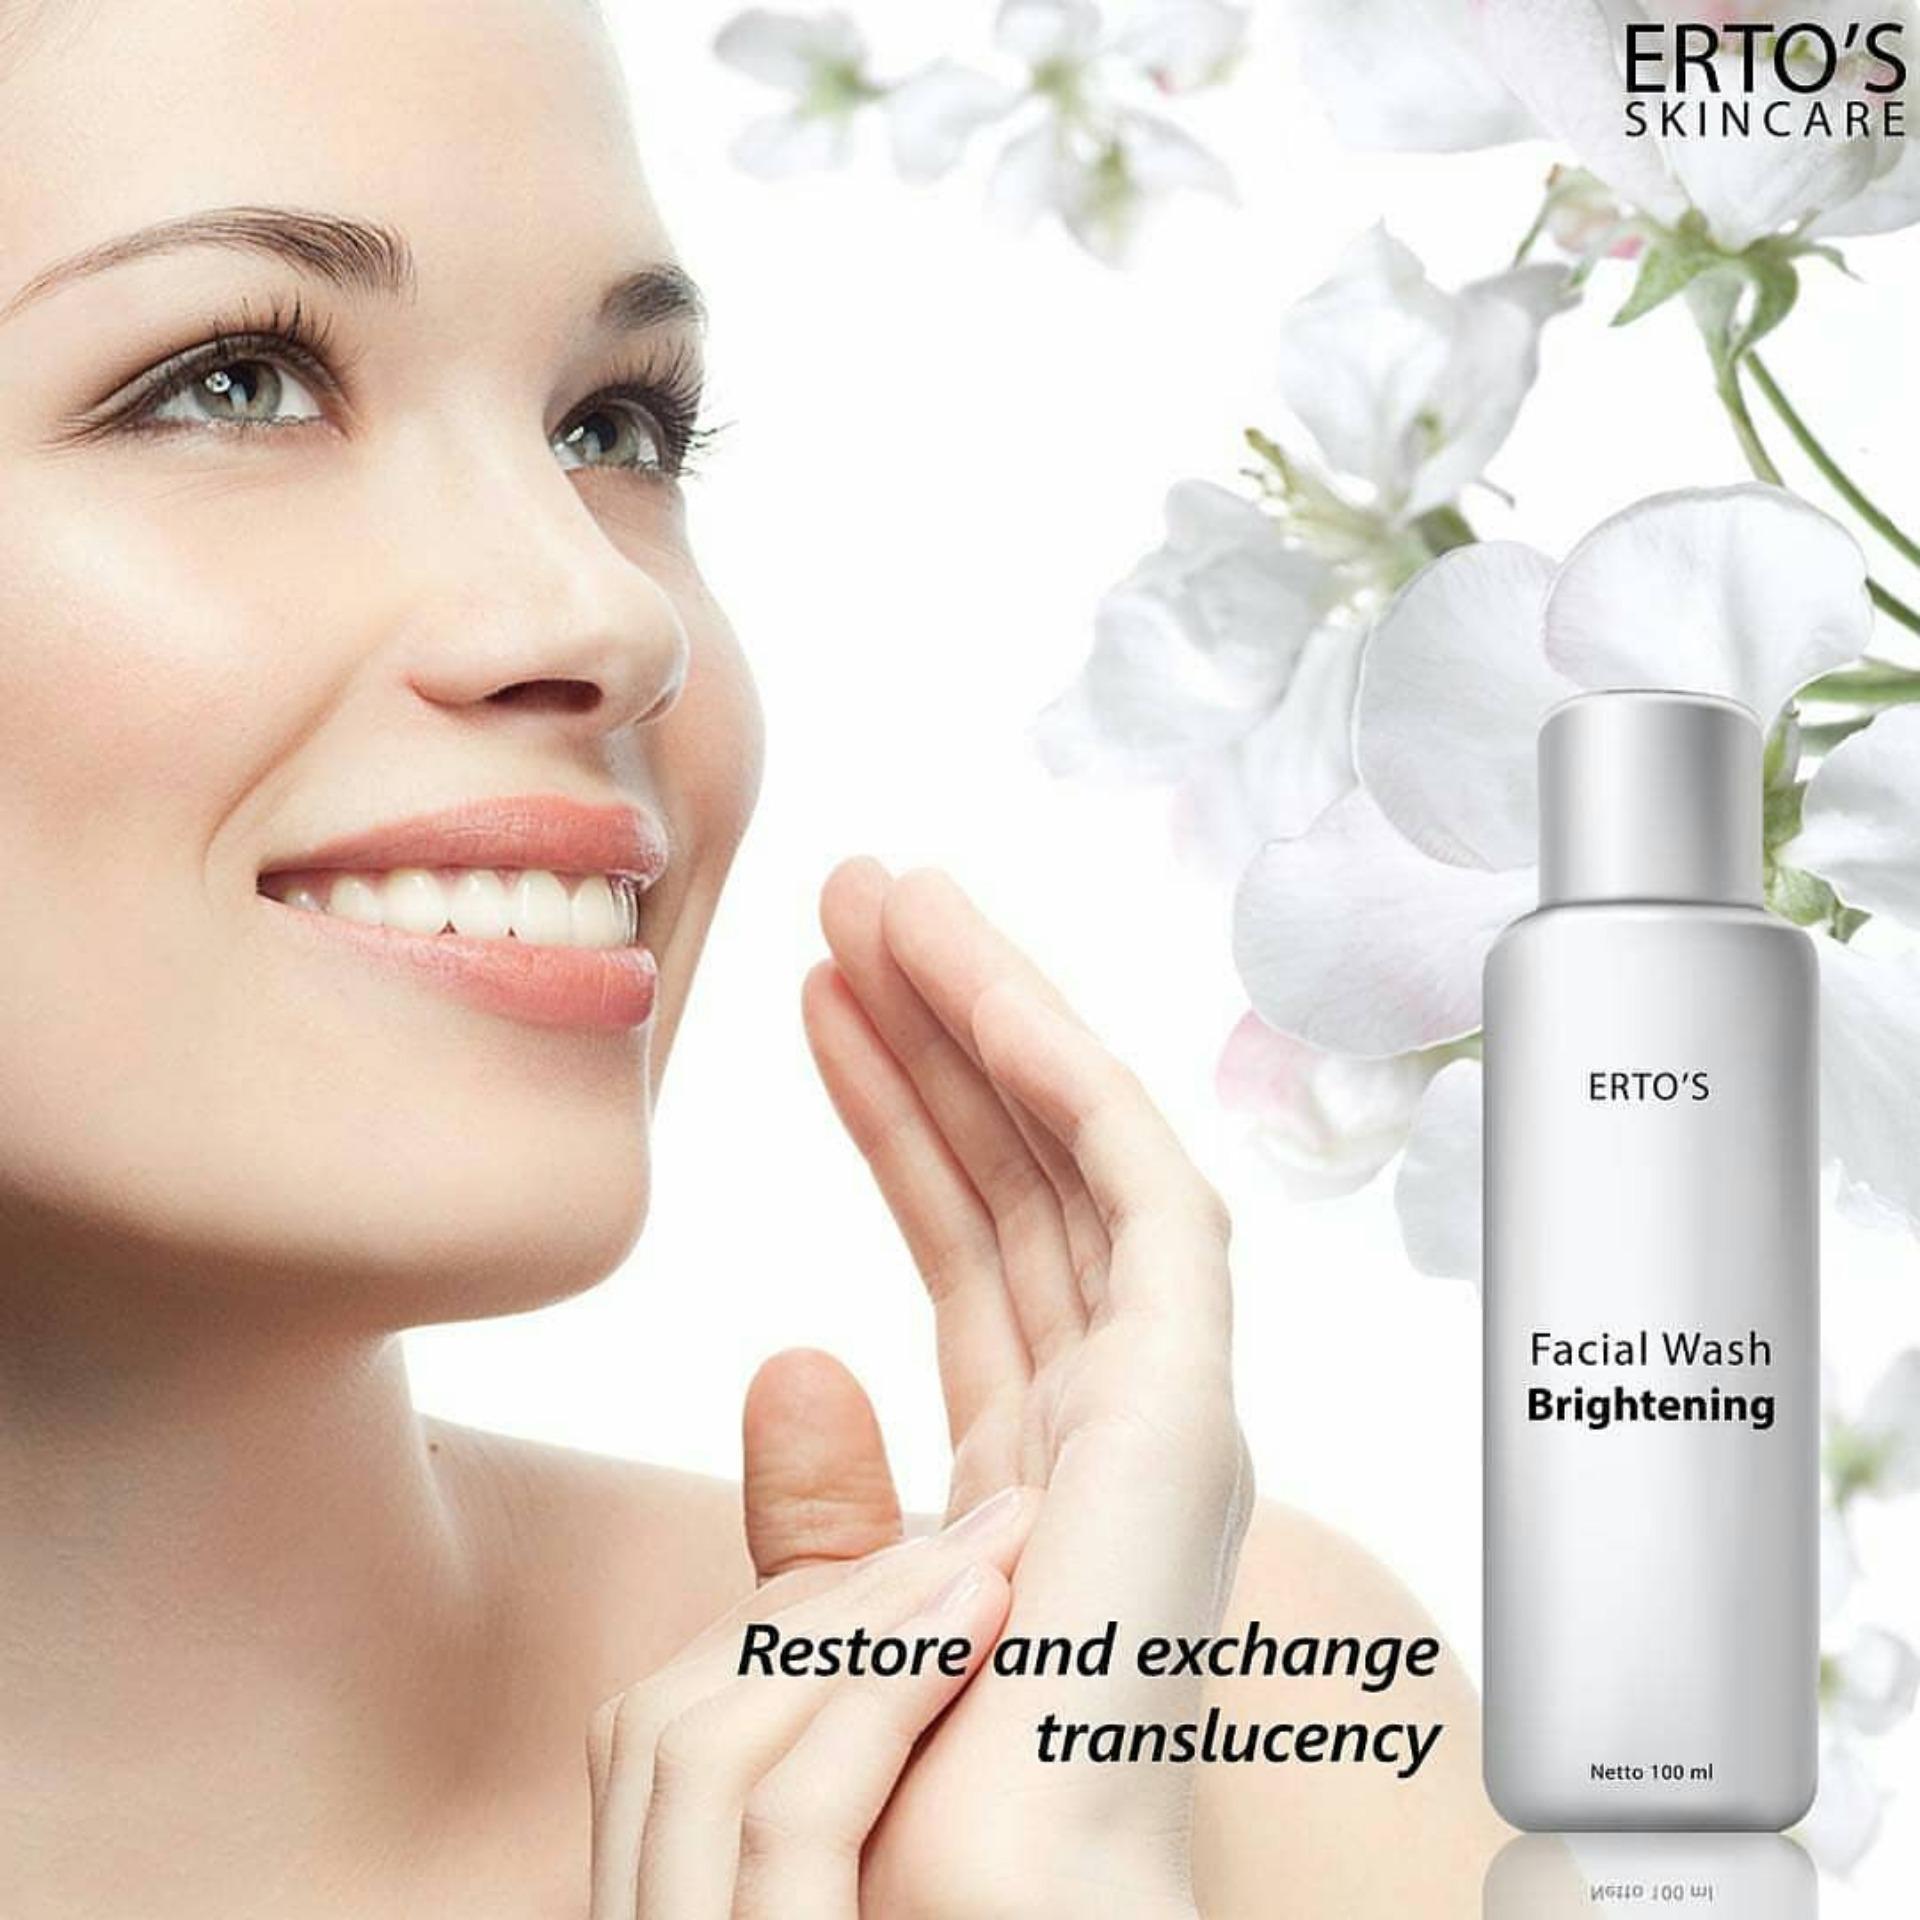 Referensi Harga Ertos Facial Treatment Sj0020 November 2018 Pembersih Wajah Wash Brightening Sabun Cuci Muka Skincare Original Bpom